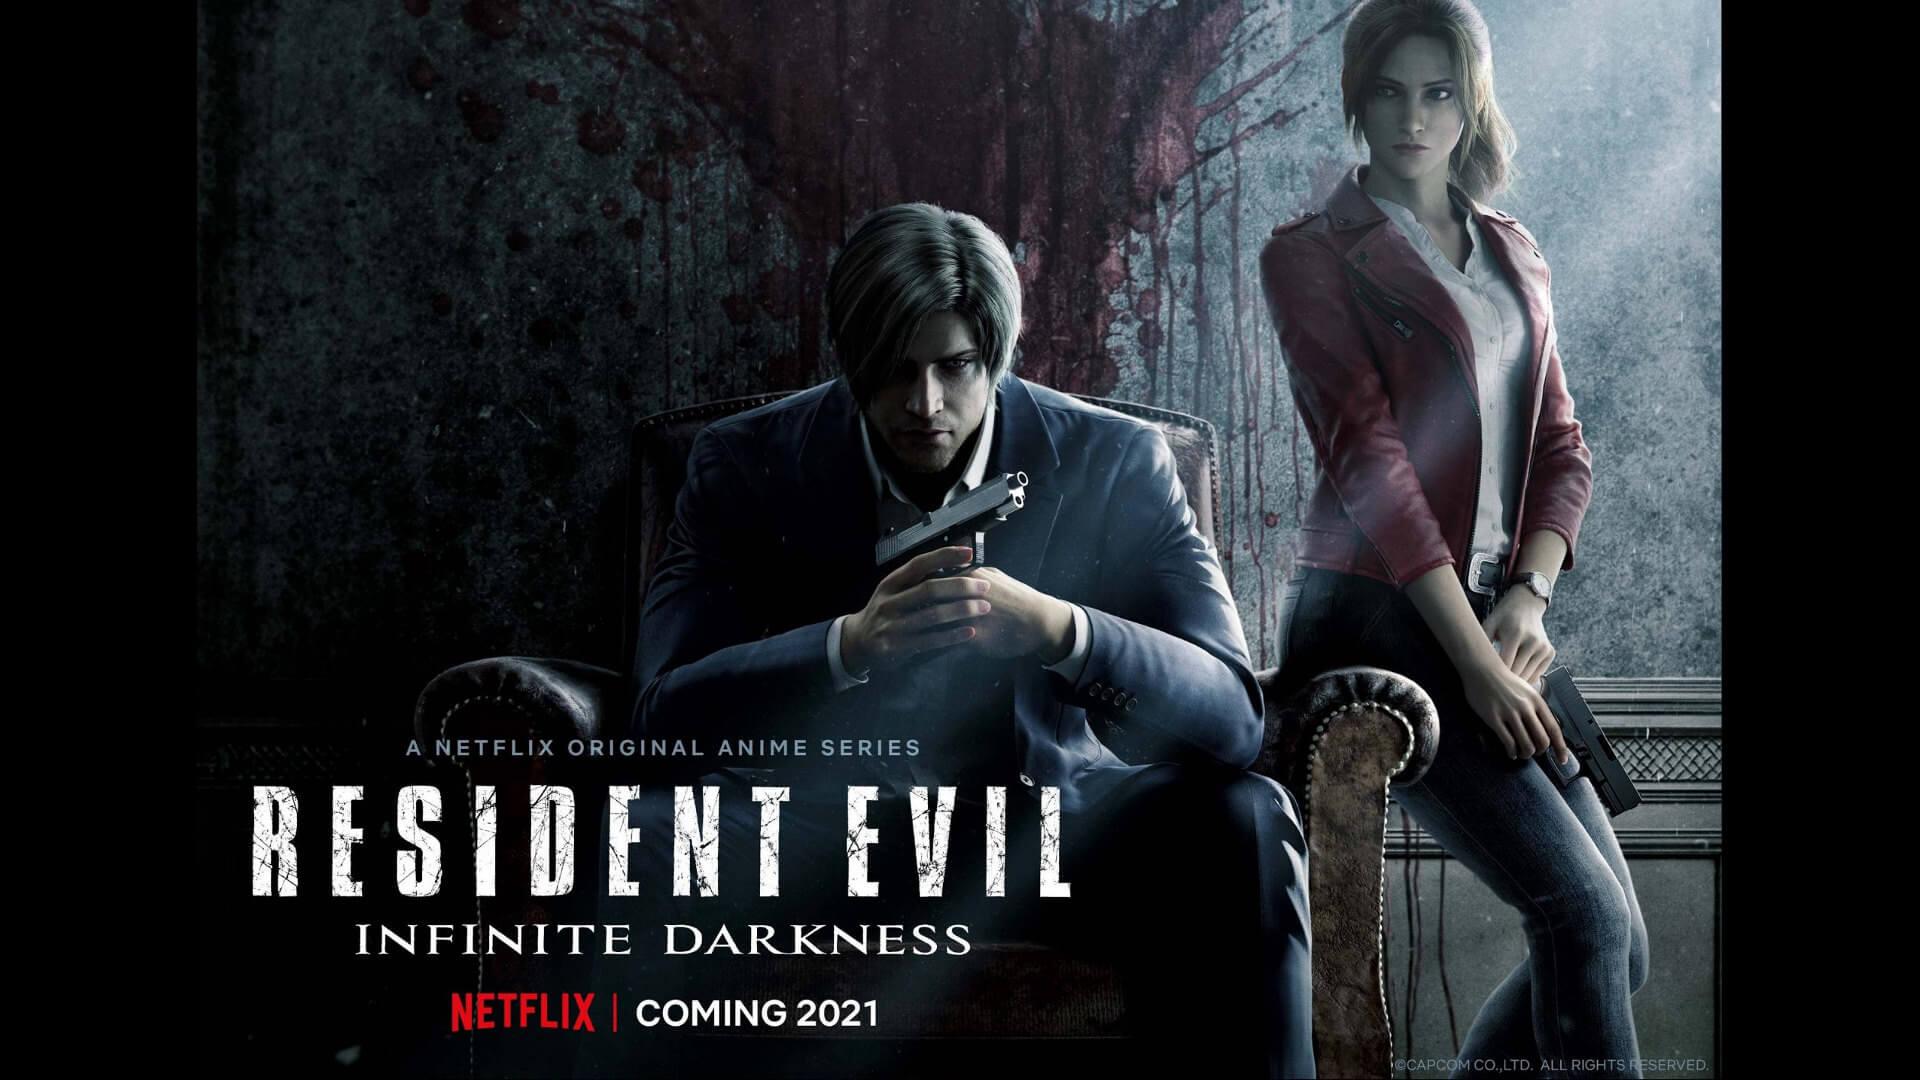 Resident Evil Infinite Darkness Promo Image